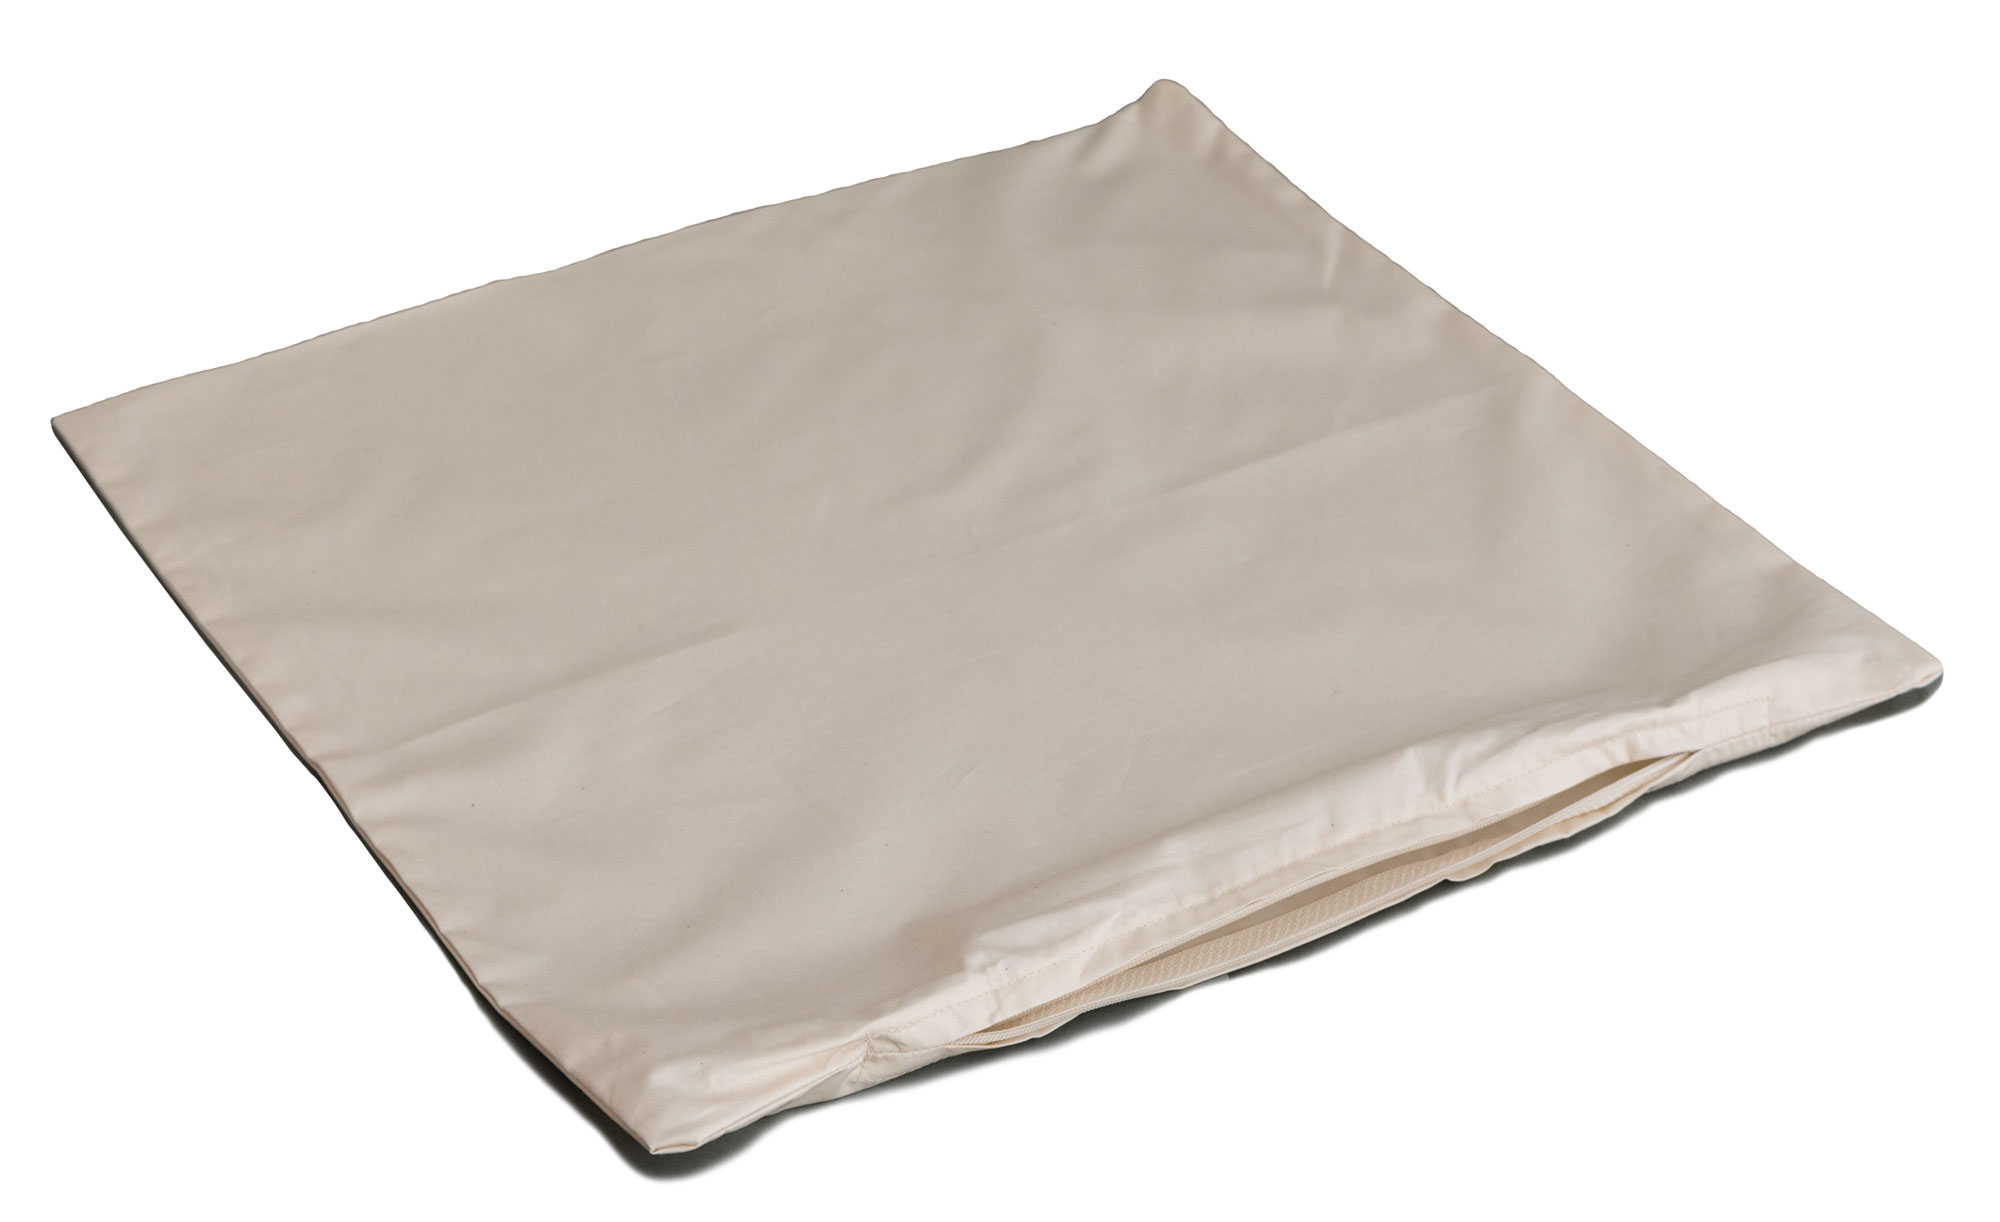 inlett 40x40cm bio baumwolle perkal inletts selber f llen kissenbez ge giraffenland. Black Bedroom Furniture Sets. Home Design Ideas